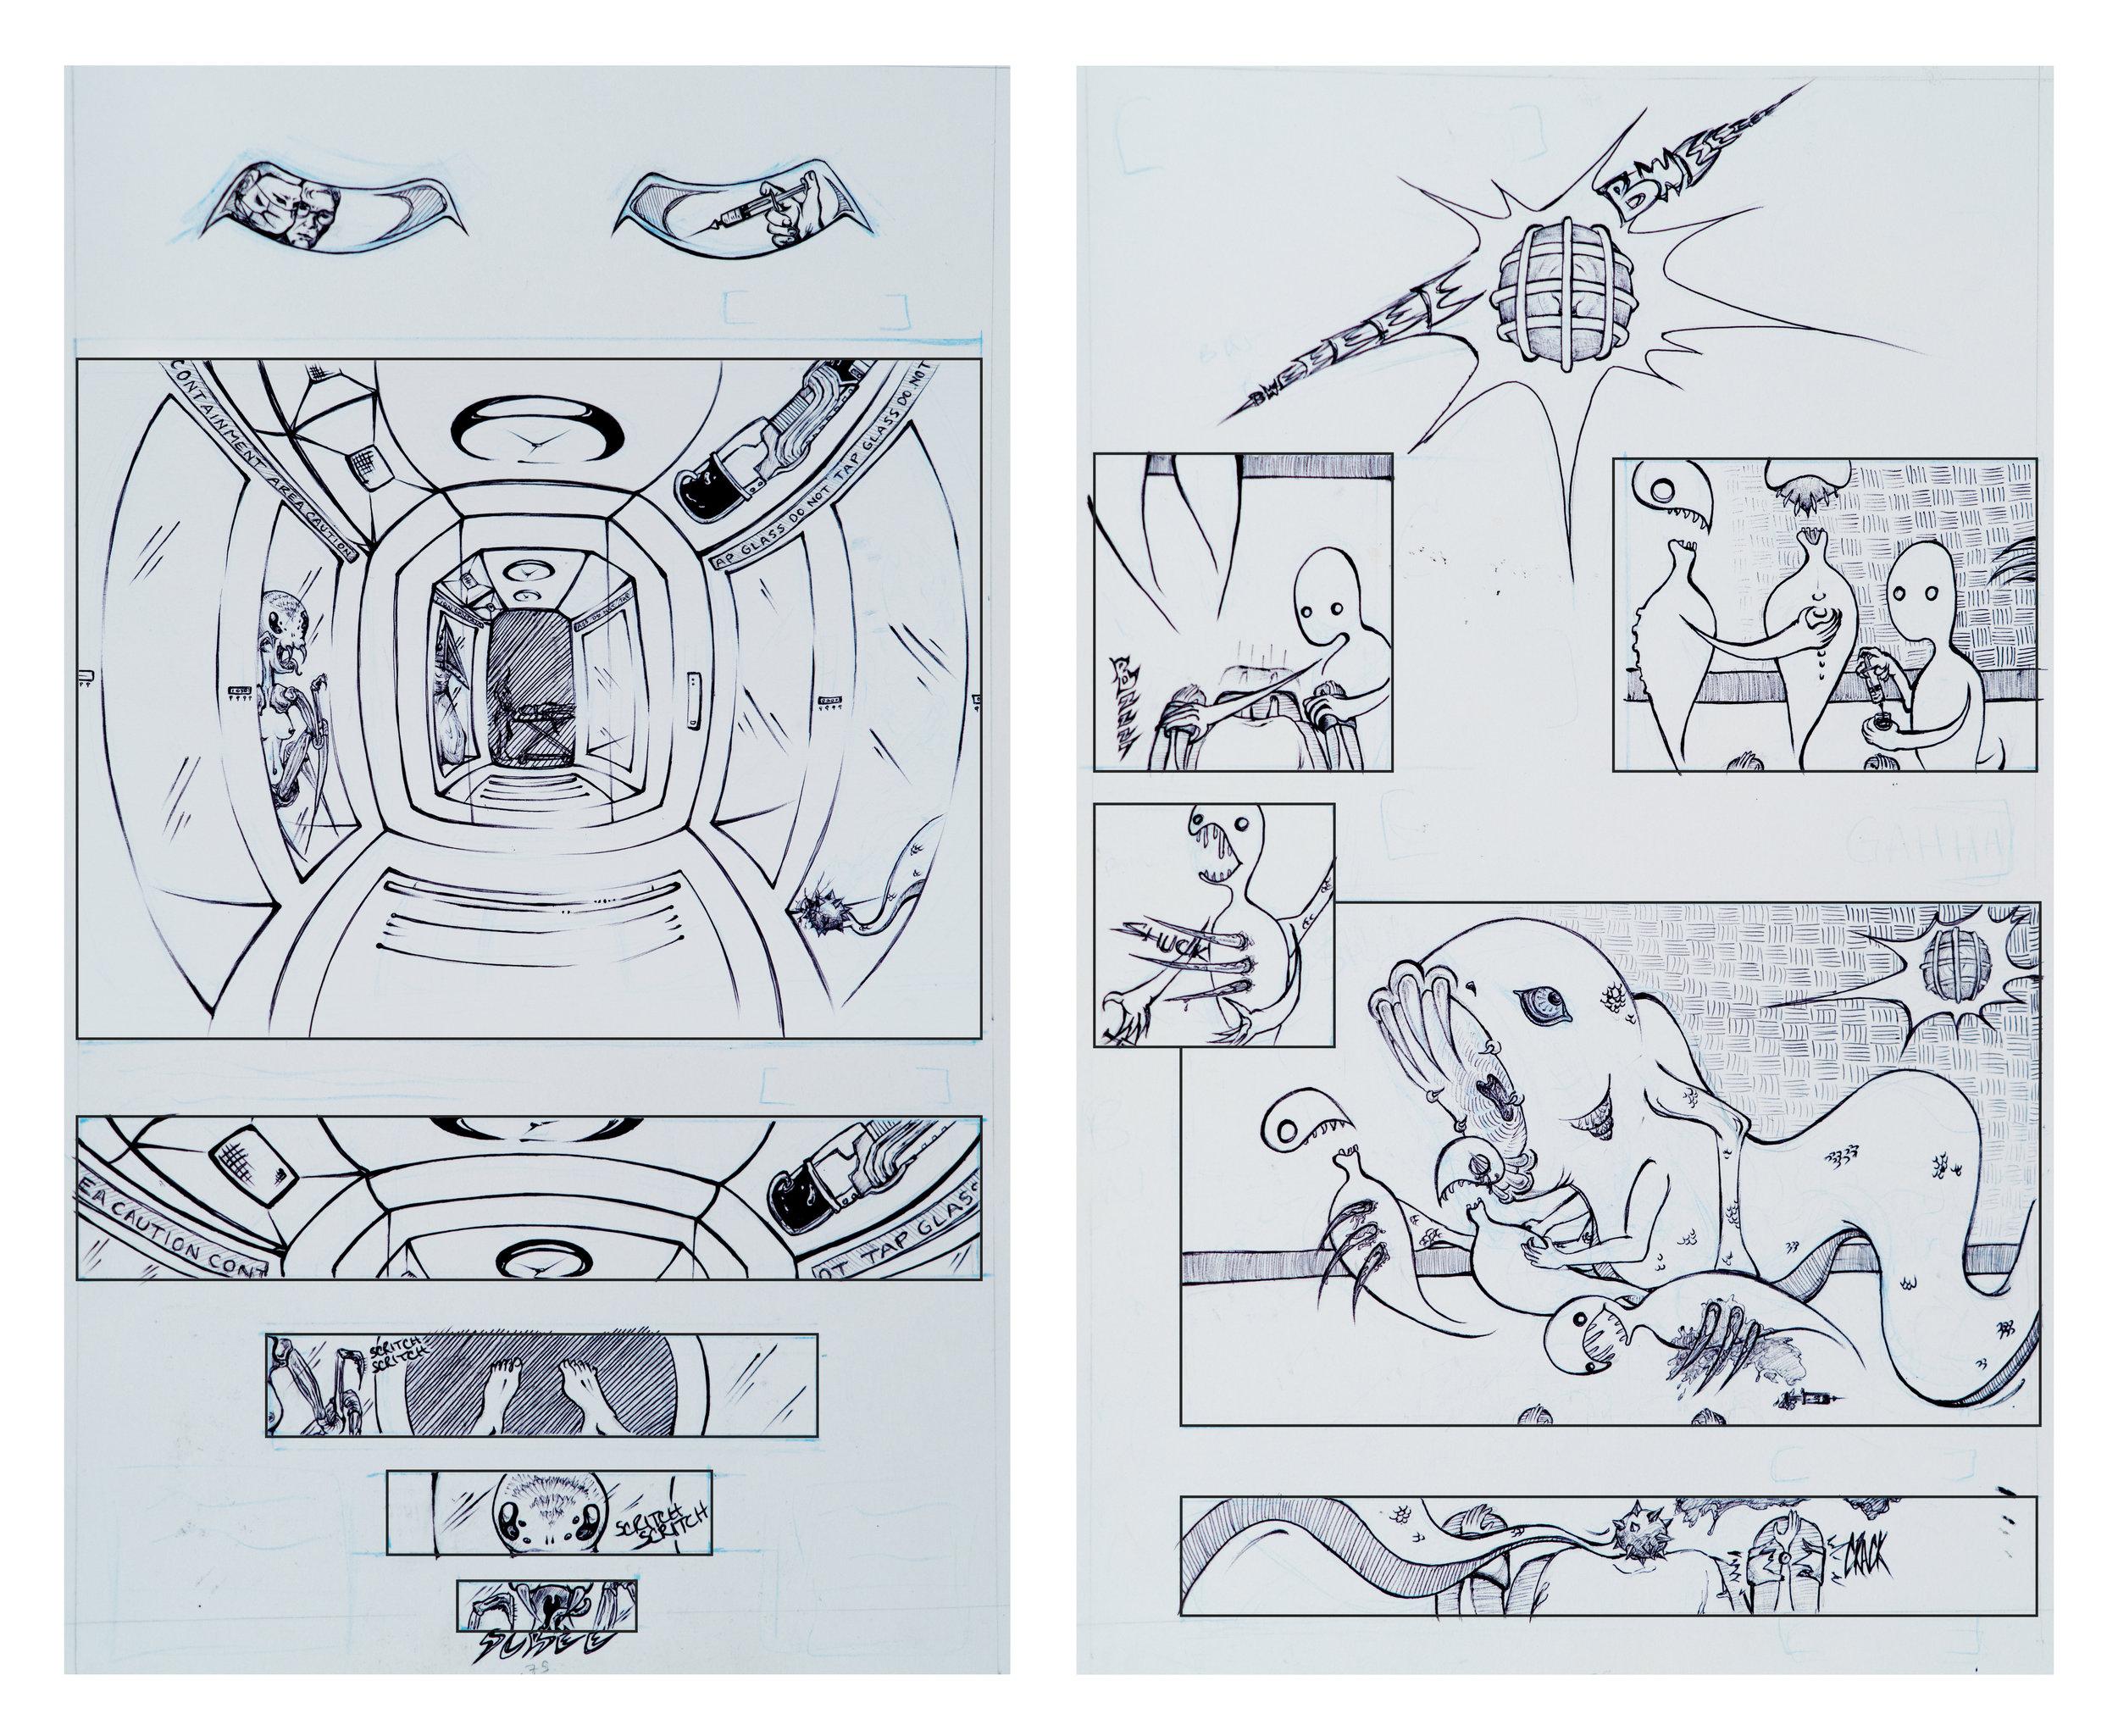 ballpoint pen concept panels for a sci-fi horror comic